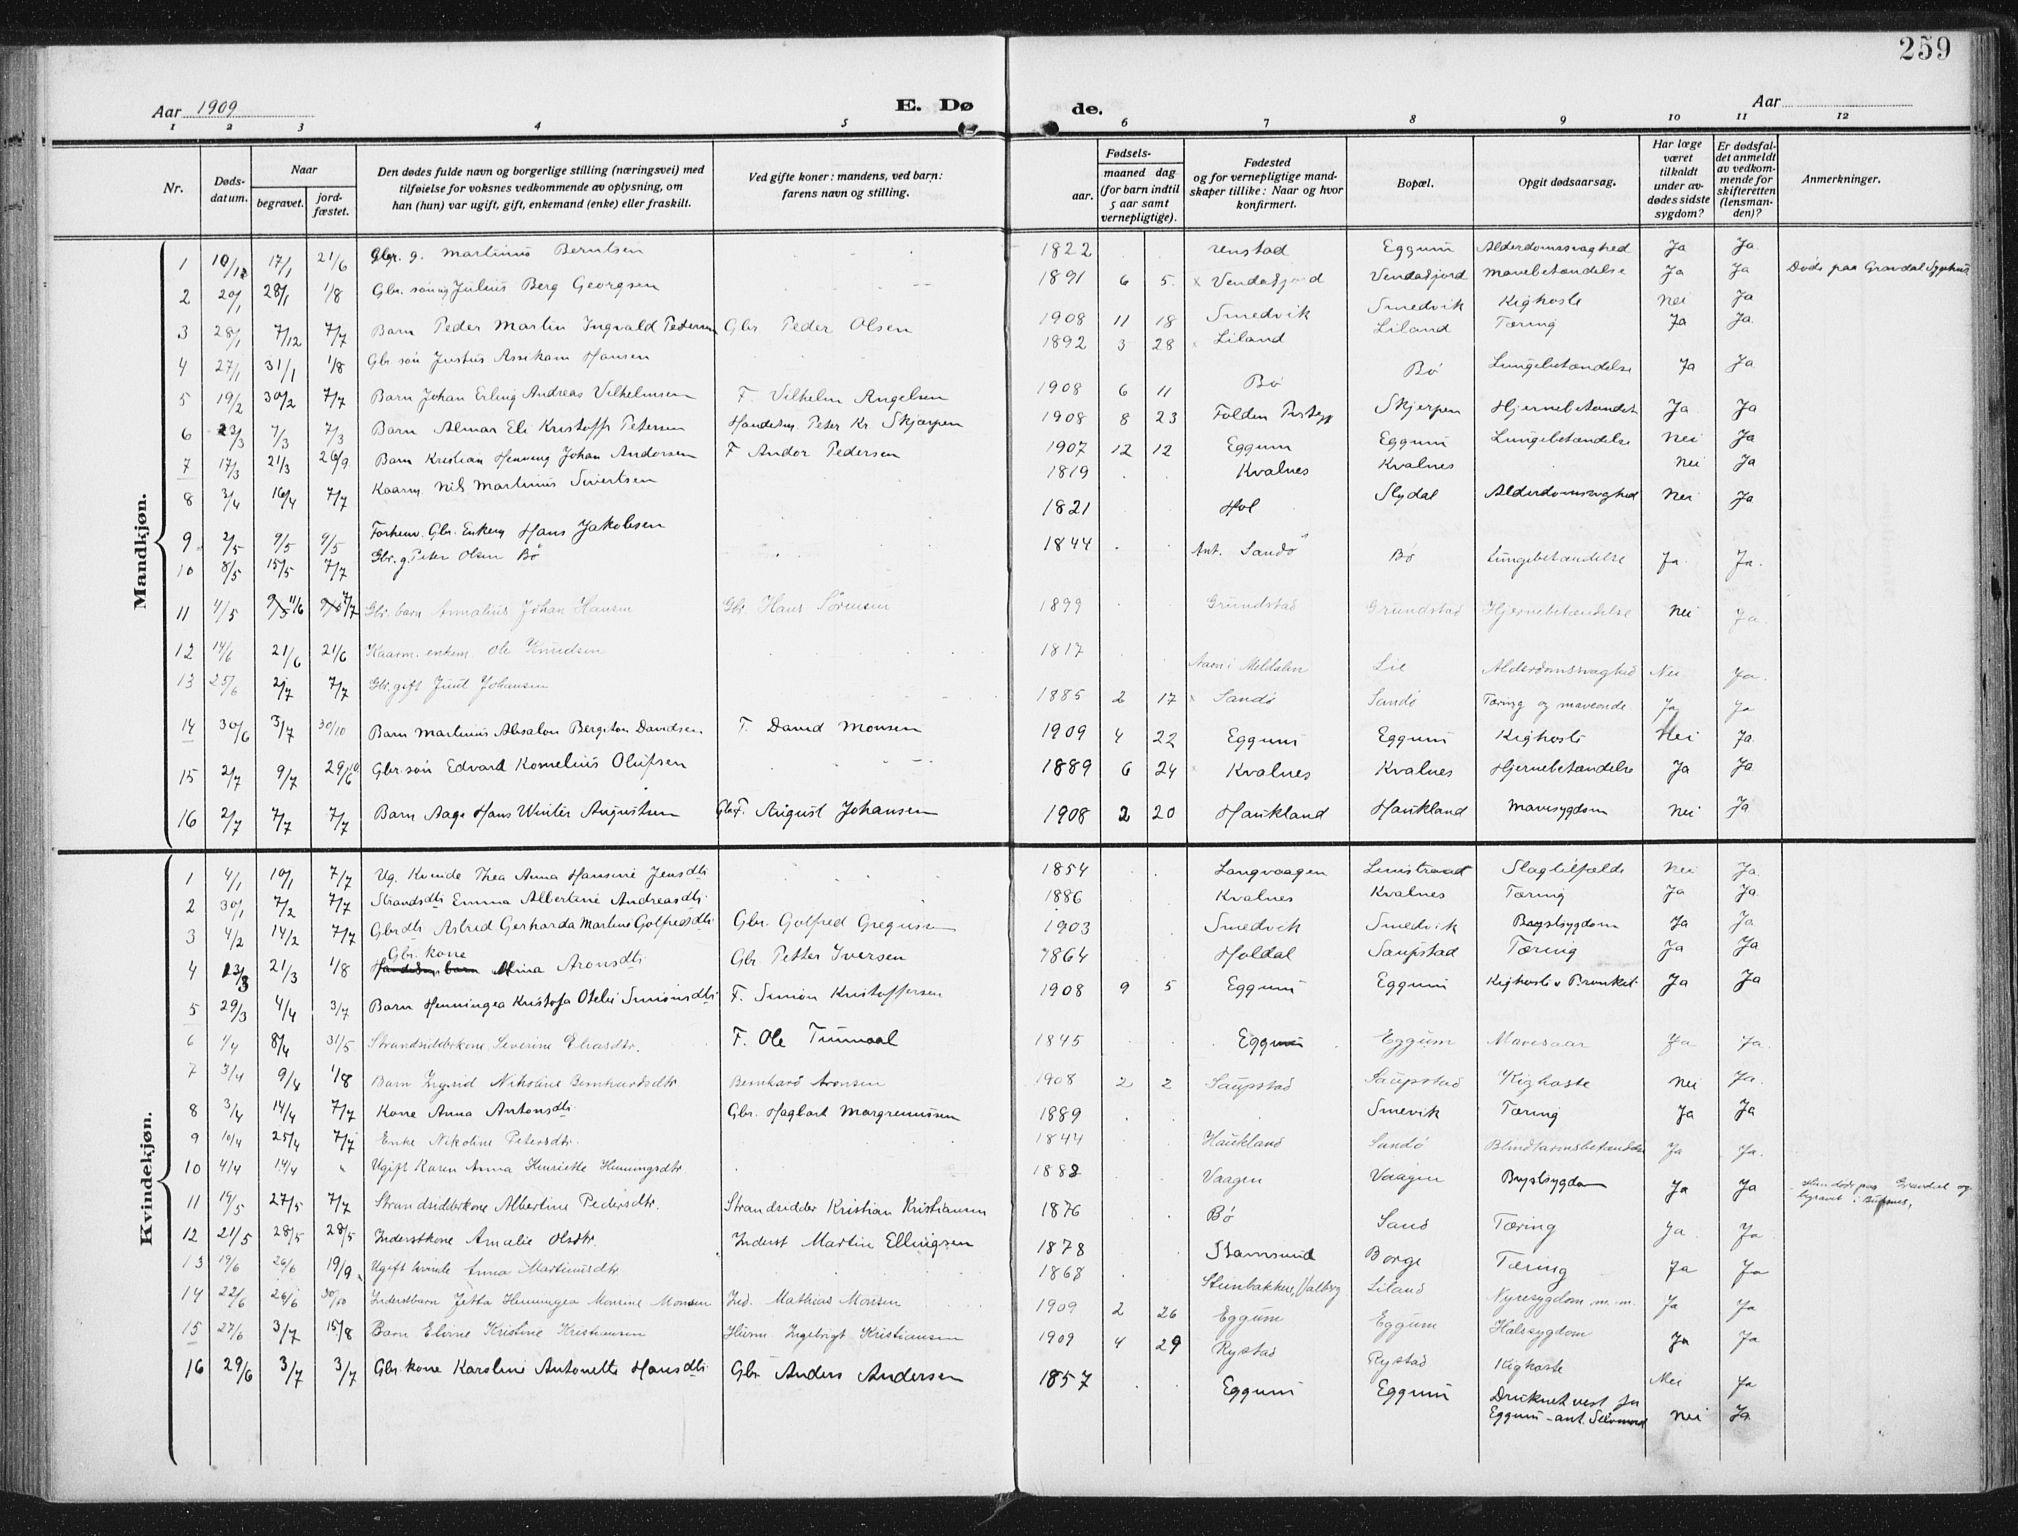 SAT, Ministerialprotokoller, klokkerbøker og fødselsregistre - Nordland, 880/L1135: Ministerialbok nr. 880A09, 1908-1919, s. 259